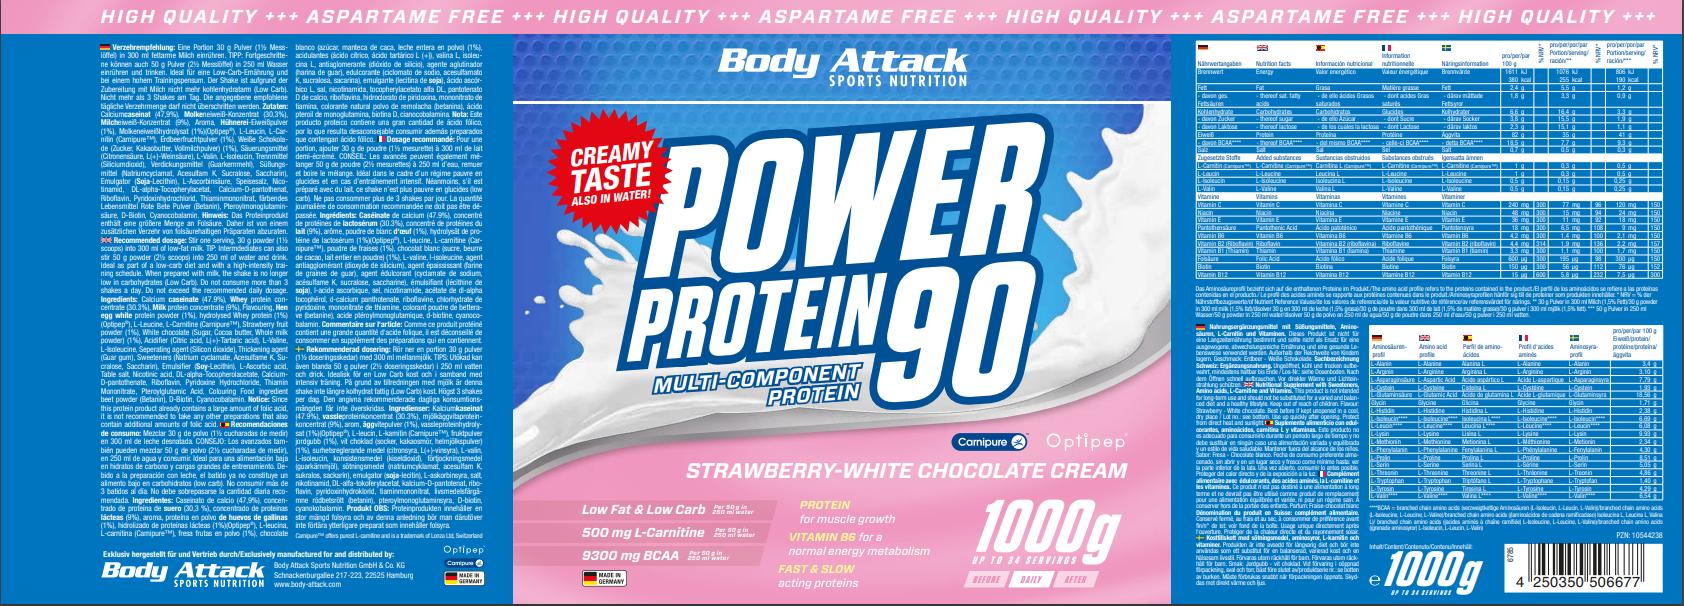 Power Proti 90 Strawberry White Chocolate